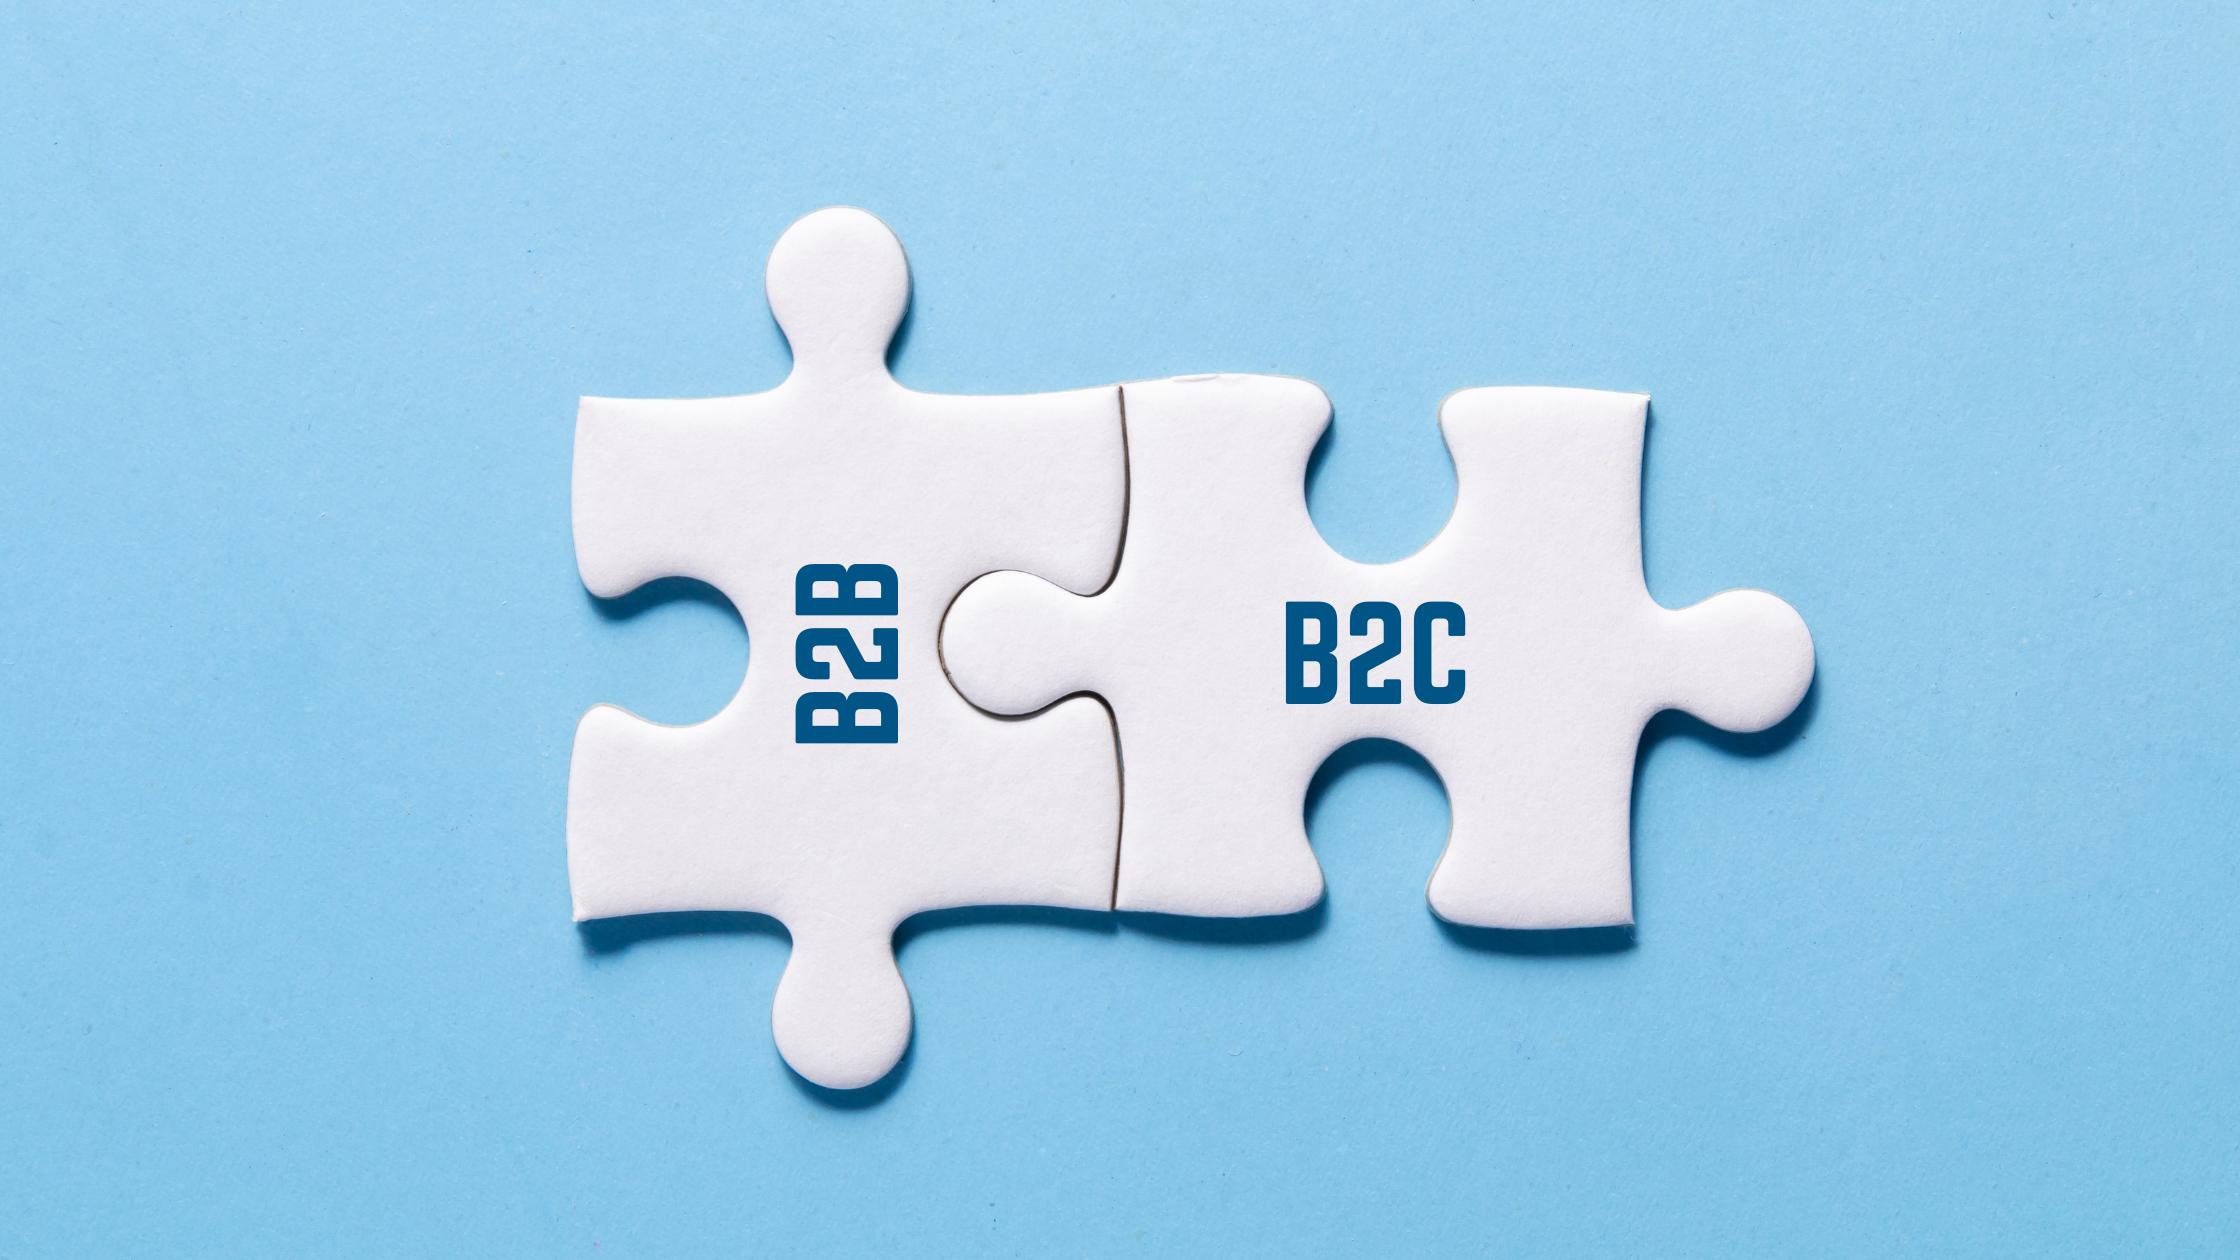 linking B2B with B2C